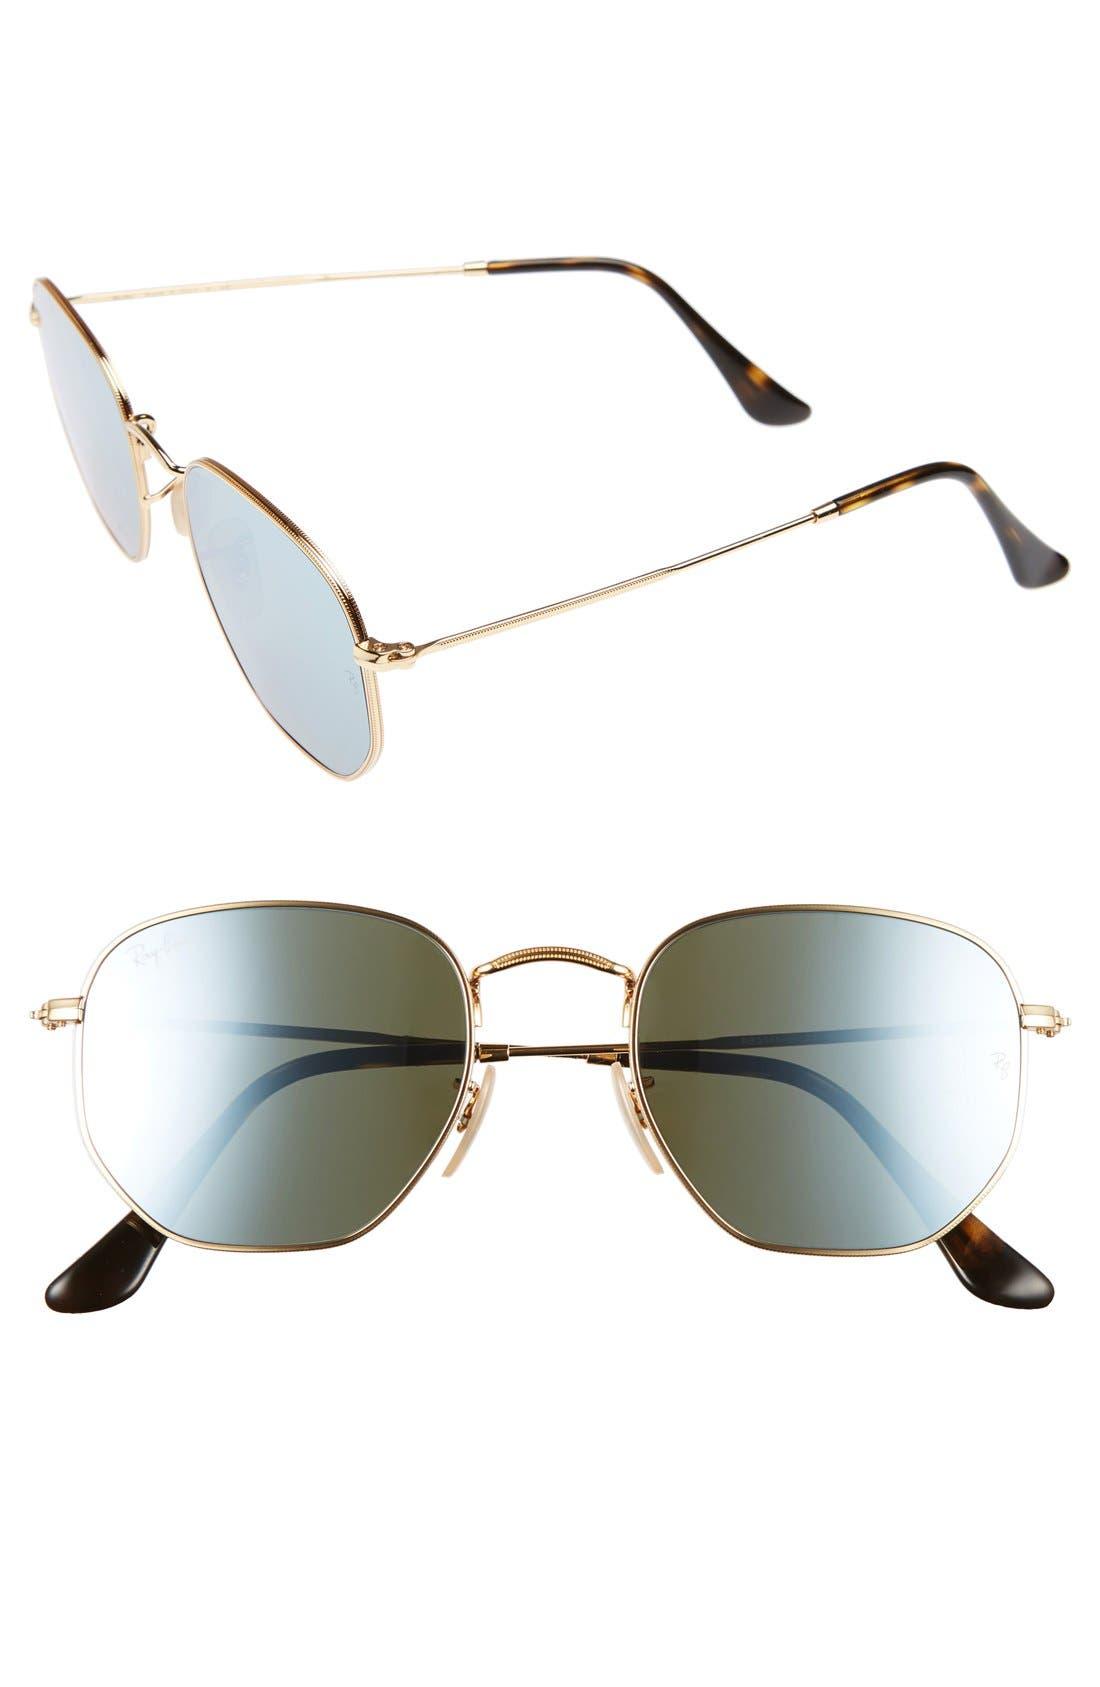 51mm Sunglasses,                             Alternate thumbnail 3, color,                             710